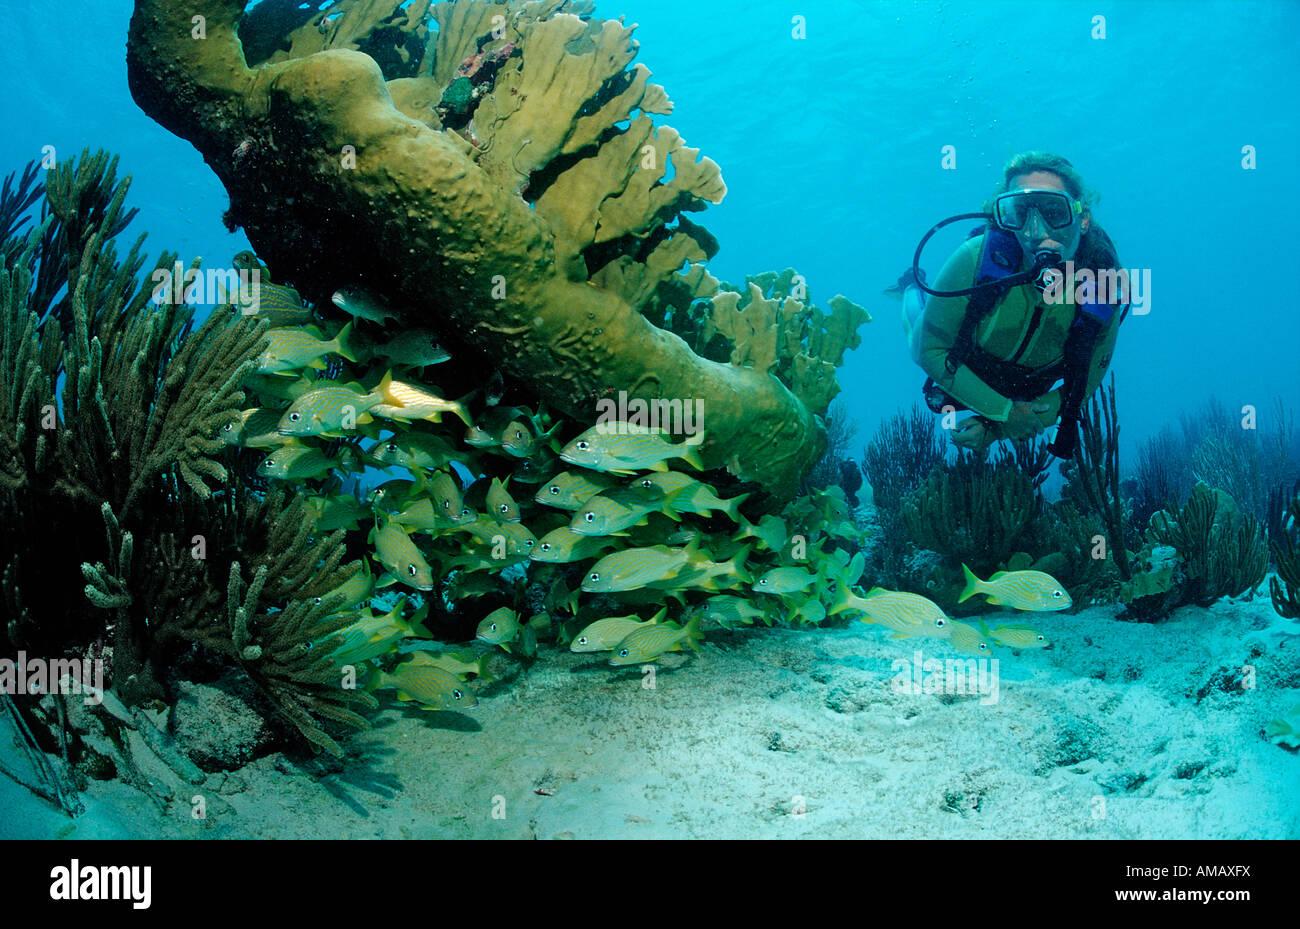 Scuba Diver e grunt francese Haemulon flavolinatum Antille Olandesi Bonaire Mar dei Caraibi Immagini Stock